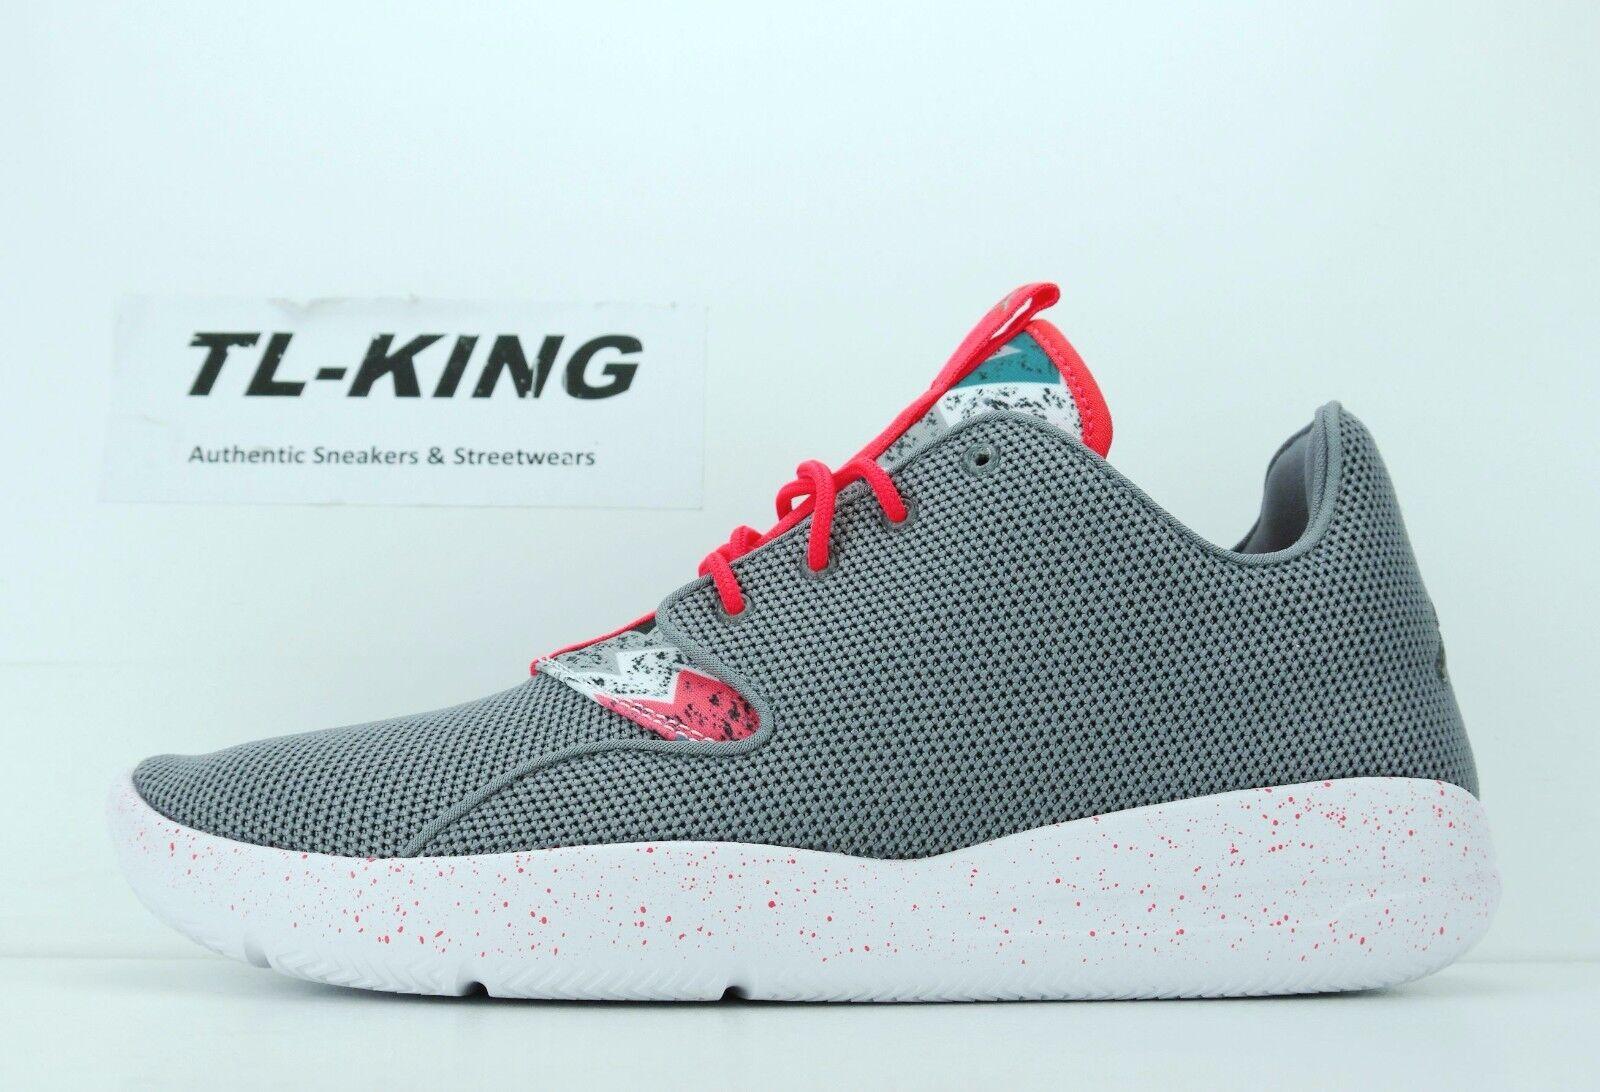 Nike Air Jordan Eclipse GG Youth Cool Grey Pewter Crimson 724356 063 Msrp Price reduction Seasonal price cuts, discount benefits